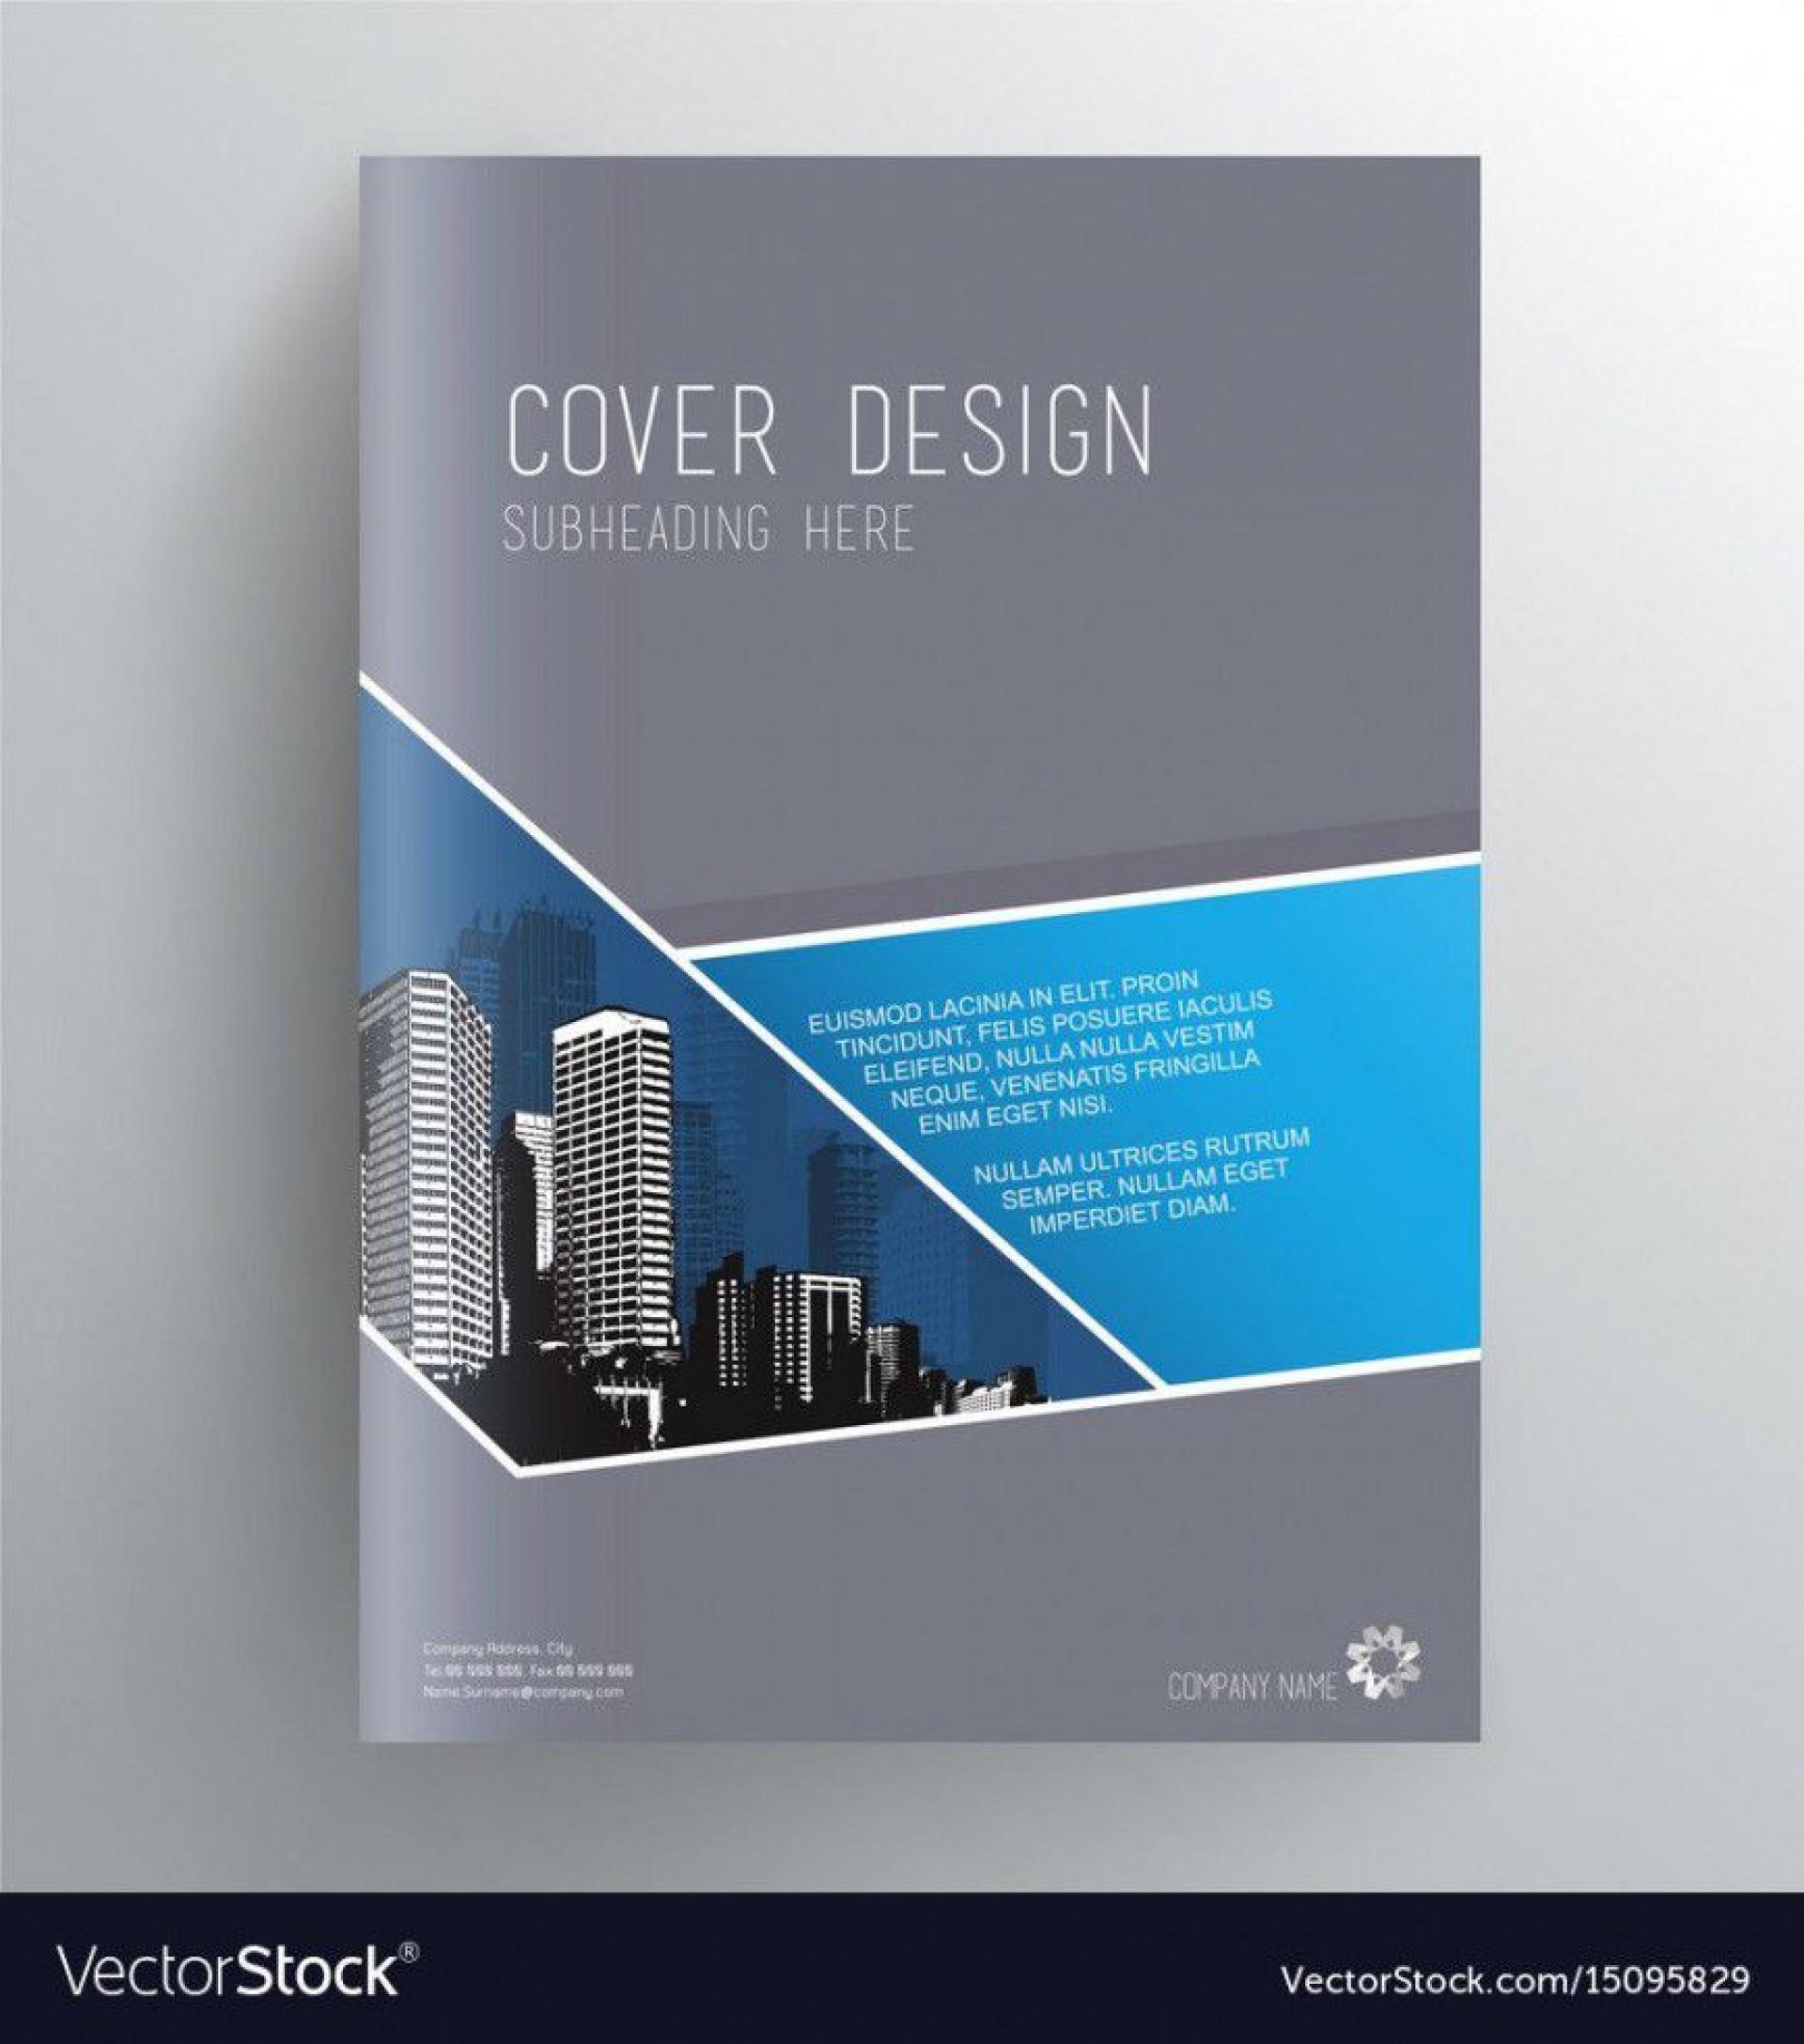 000 Striking Book Cover Template Free Download Sample  Illustrator Design Vector Illustration1920